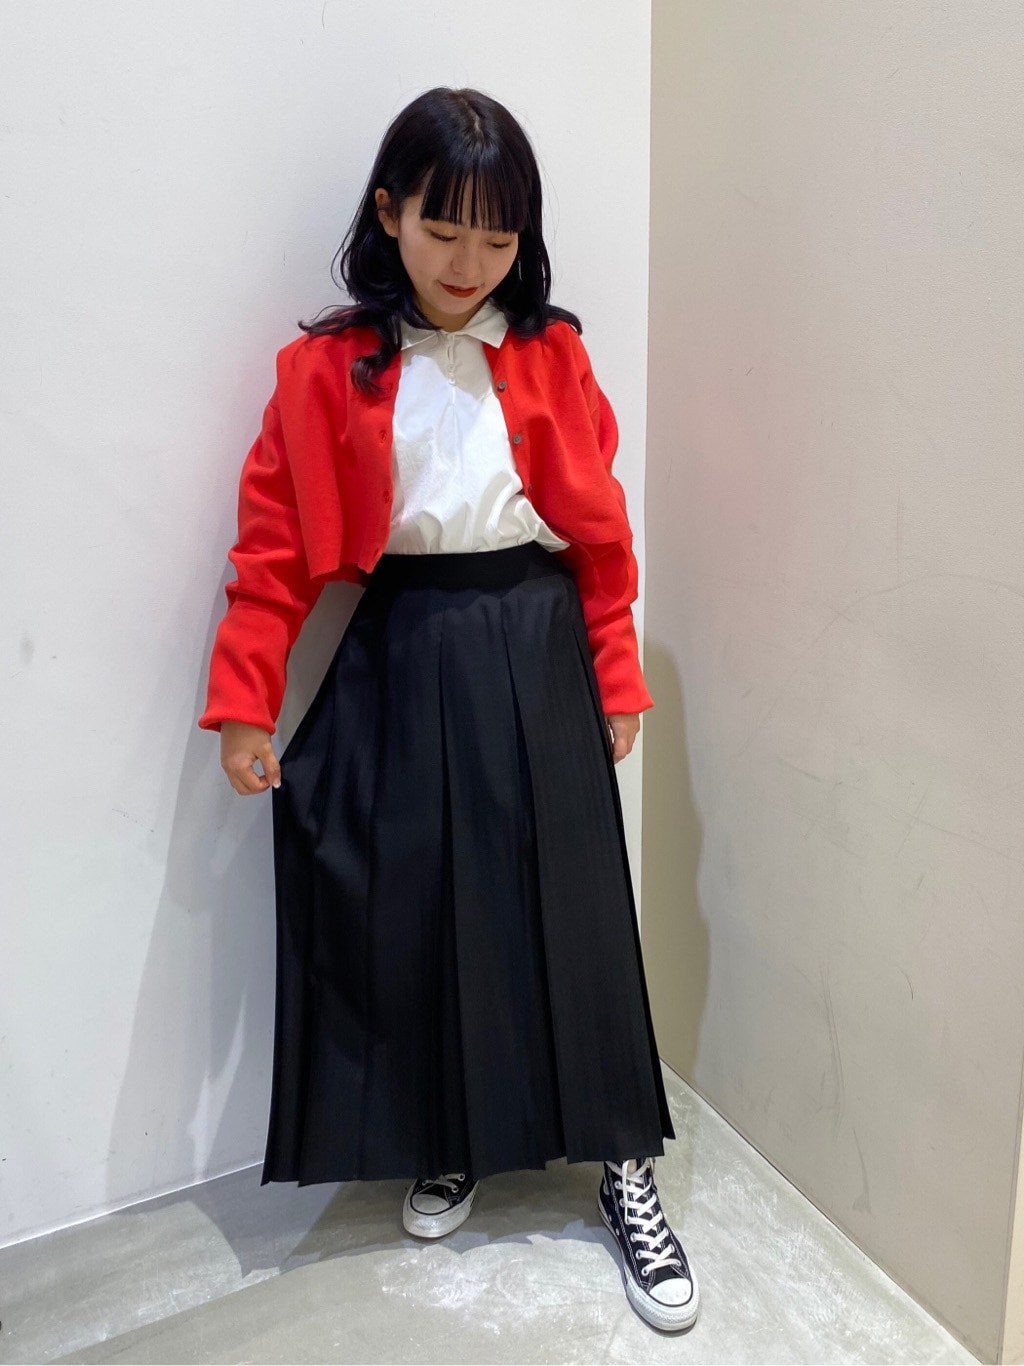 bulle de savon 阪急西宮ガーデンズ 身長:150cm 2021.02.23